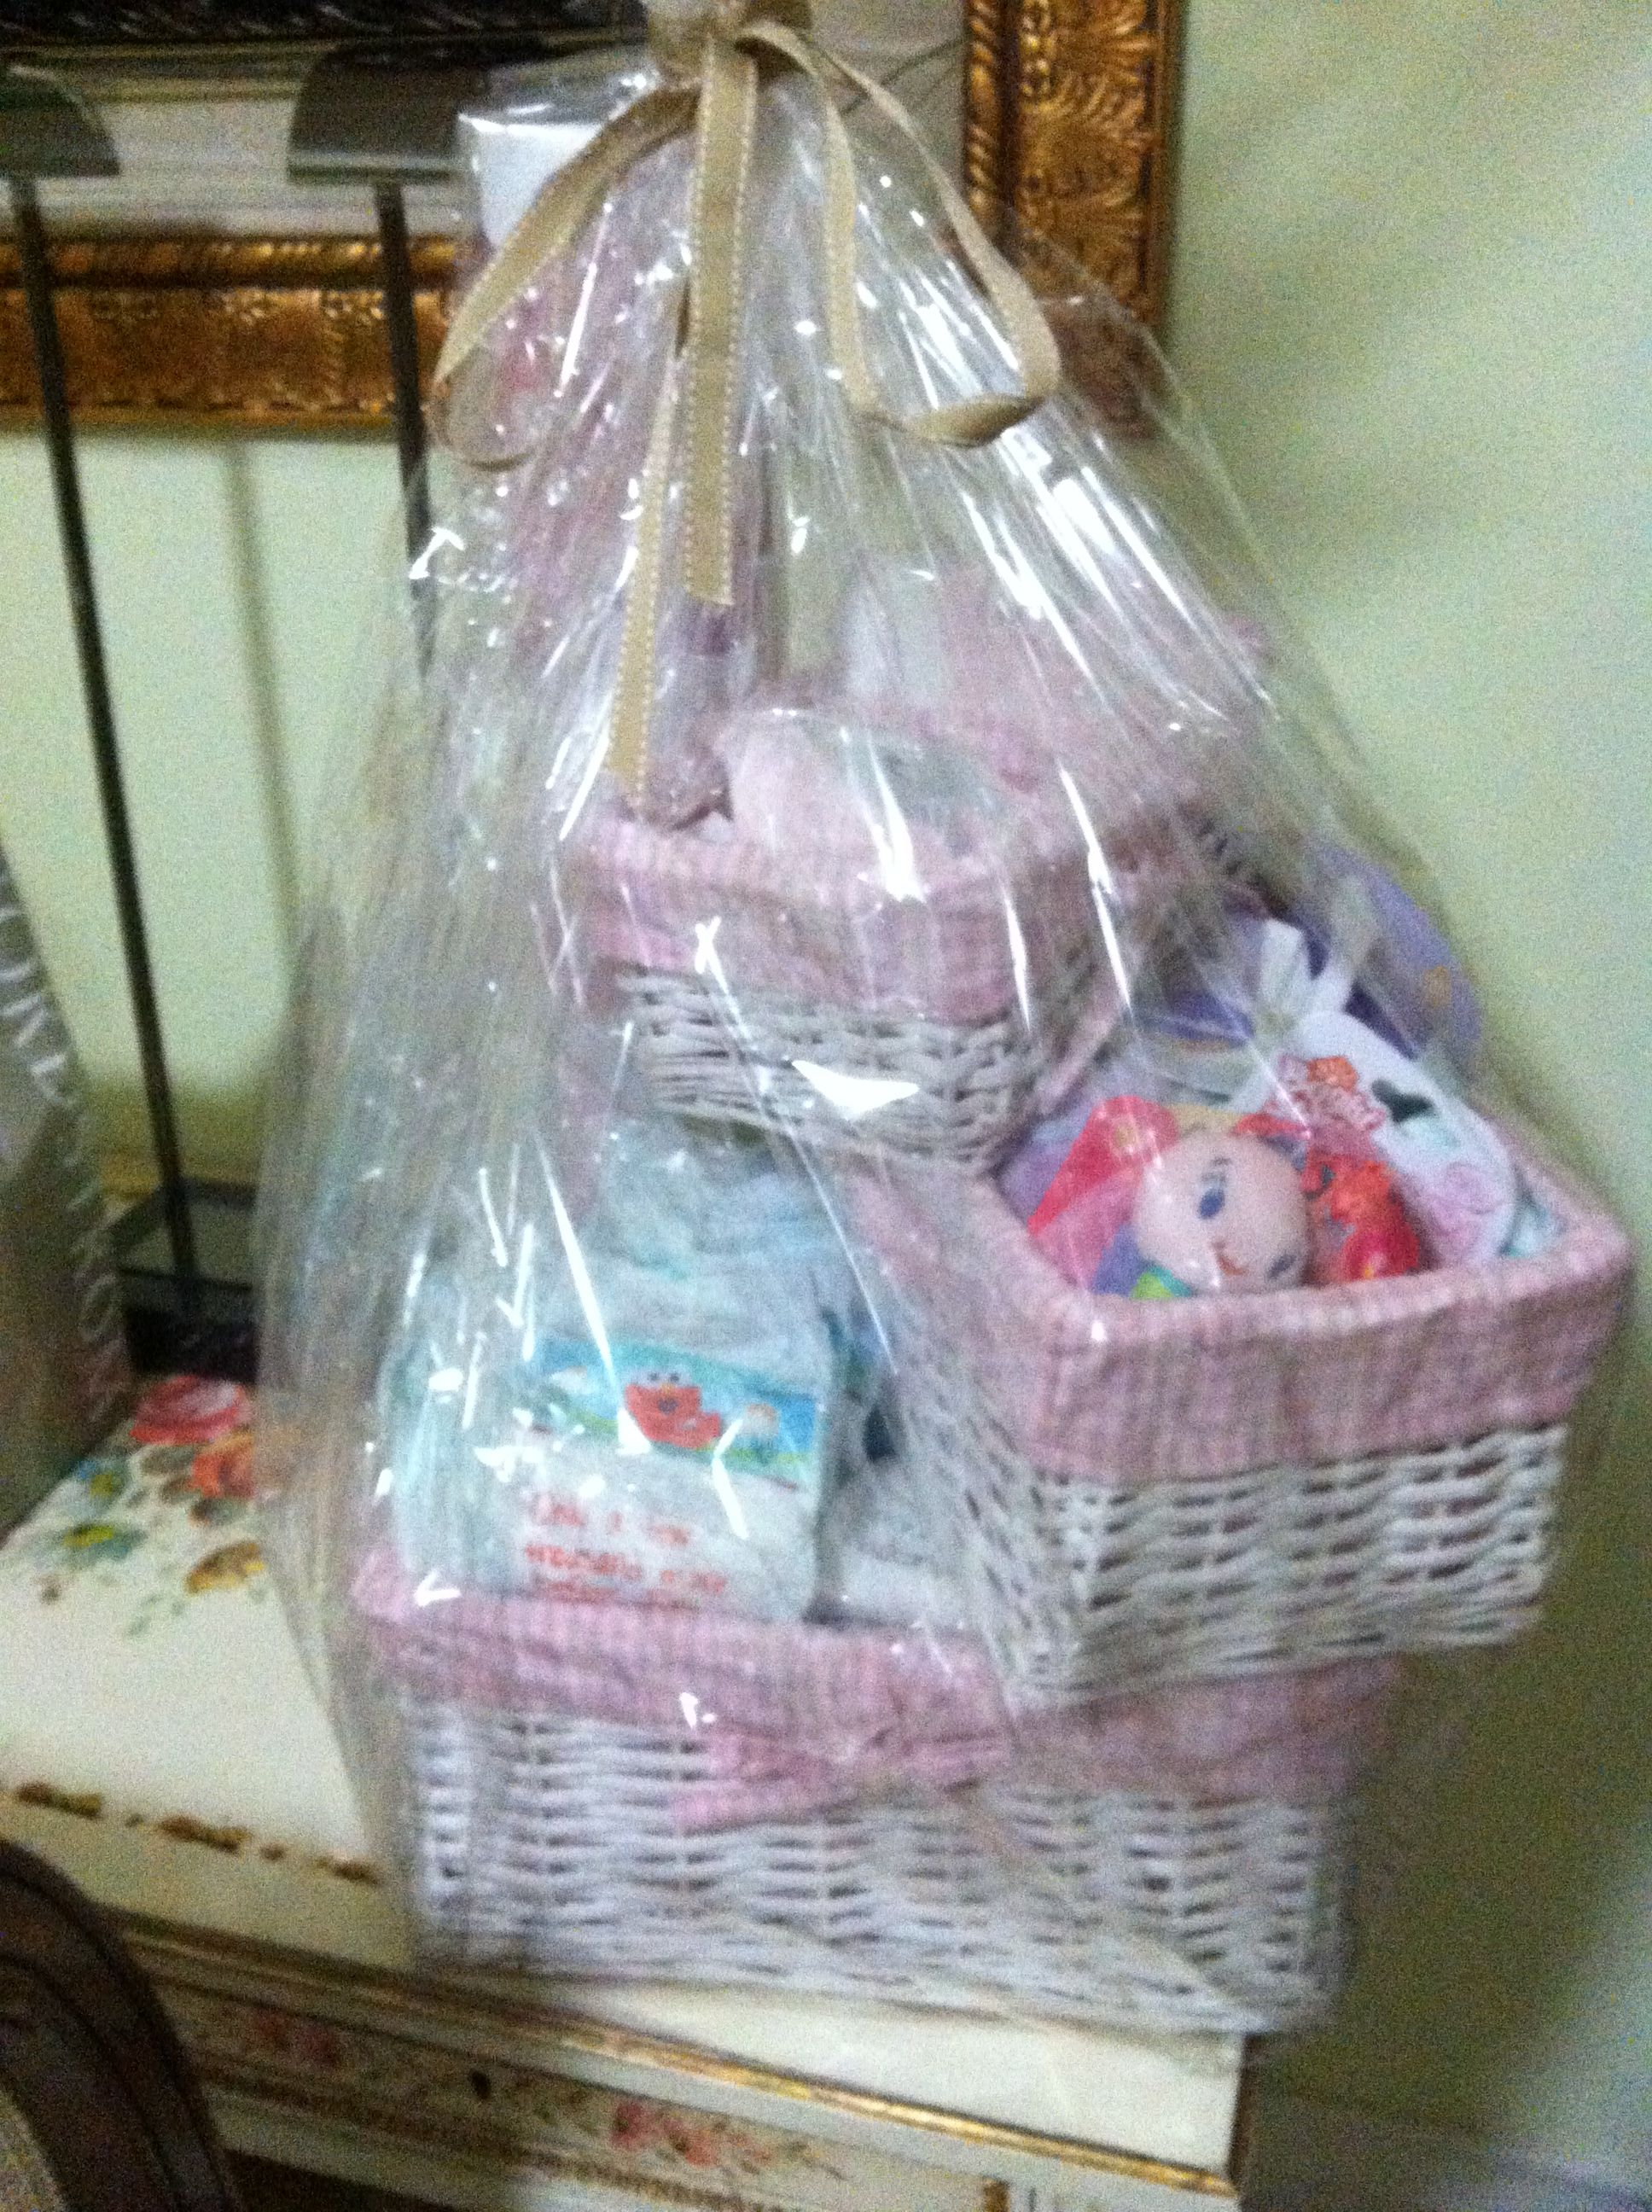 Baby shower gift: diapers, wipes, onesies, blanket ...